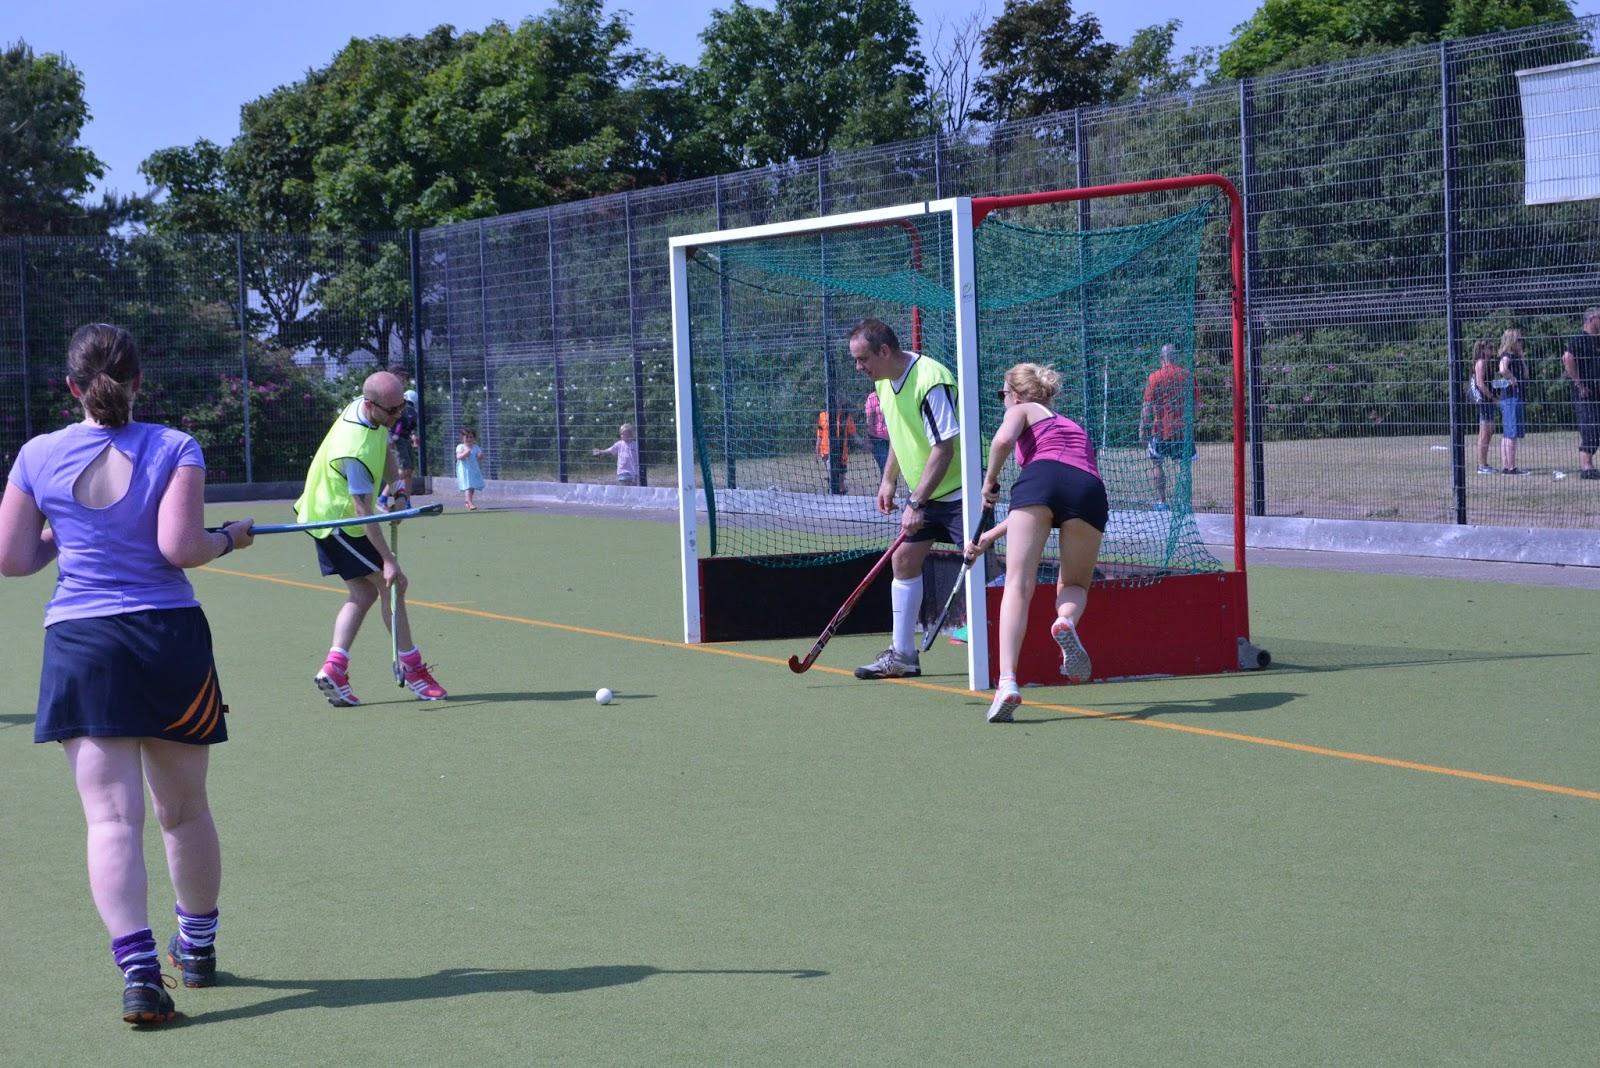 britain, england hockey, hockey, sport, fitness, sunny, england, lytham, field hockey